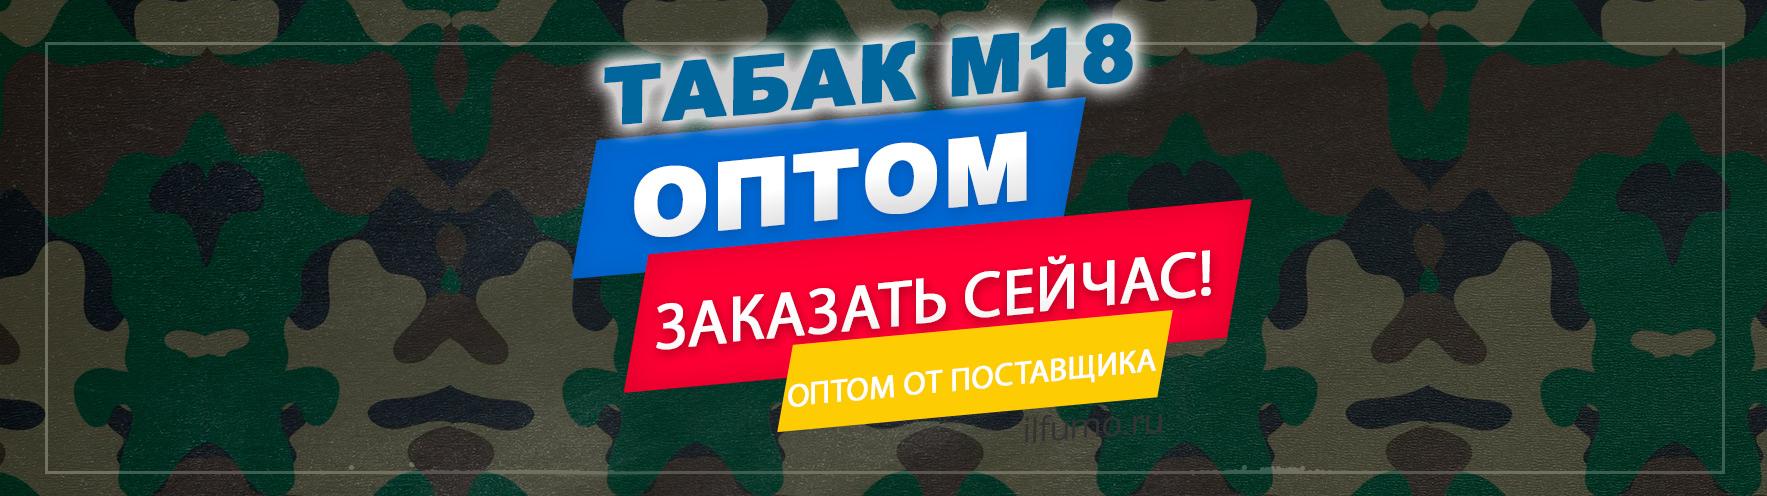 tabak dlja kaljana m18 - Табак для кальяна М18